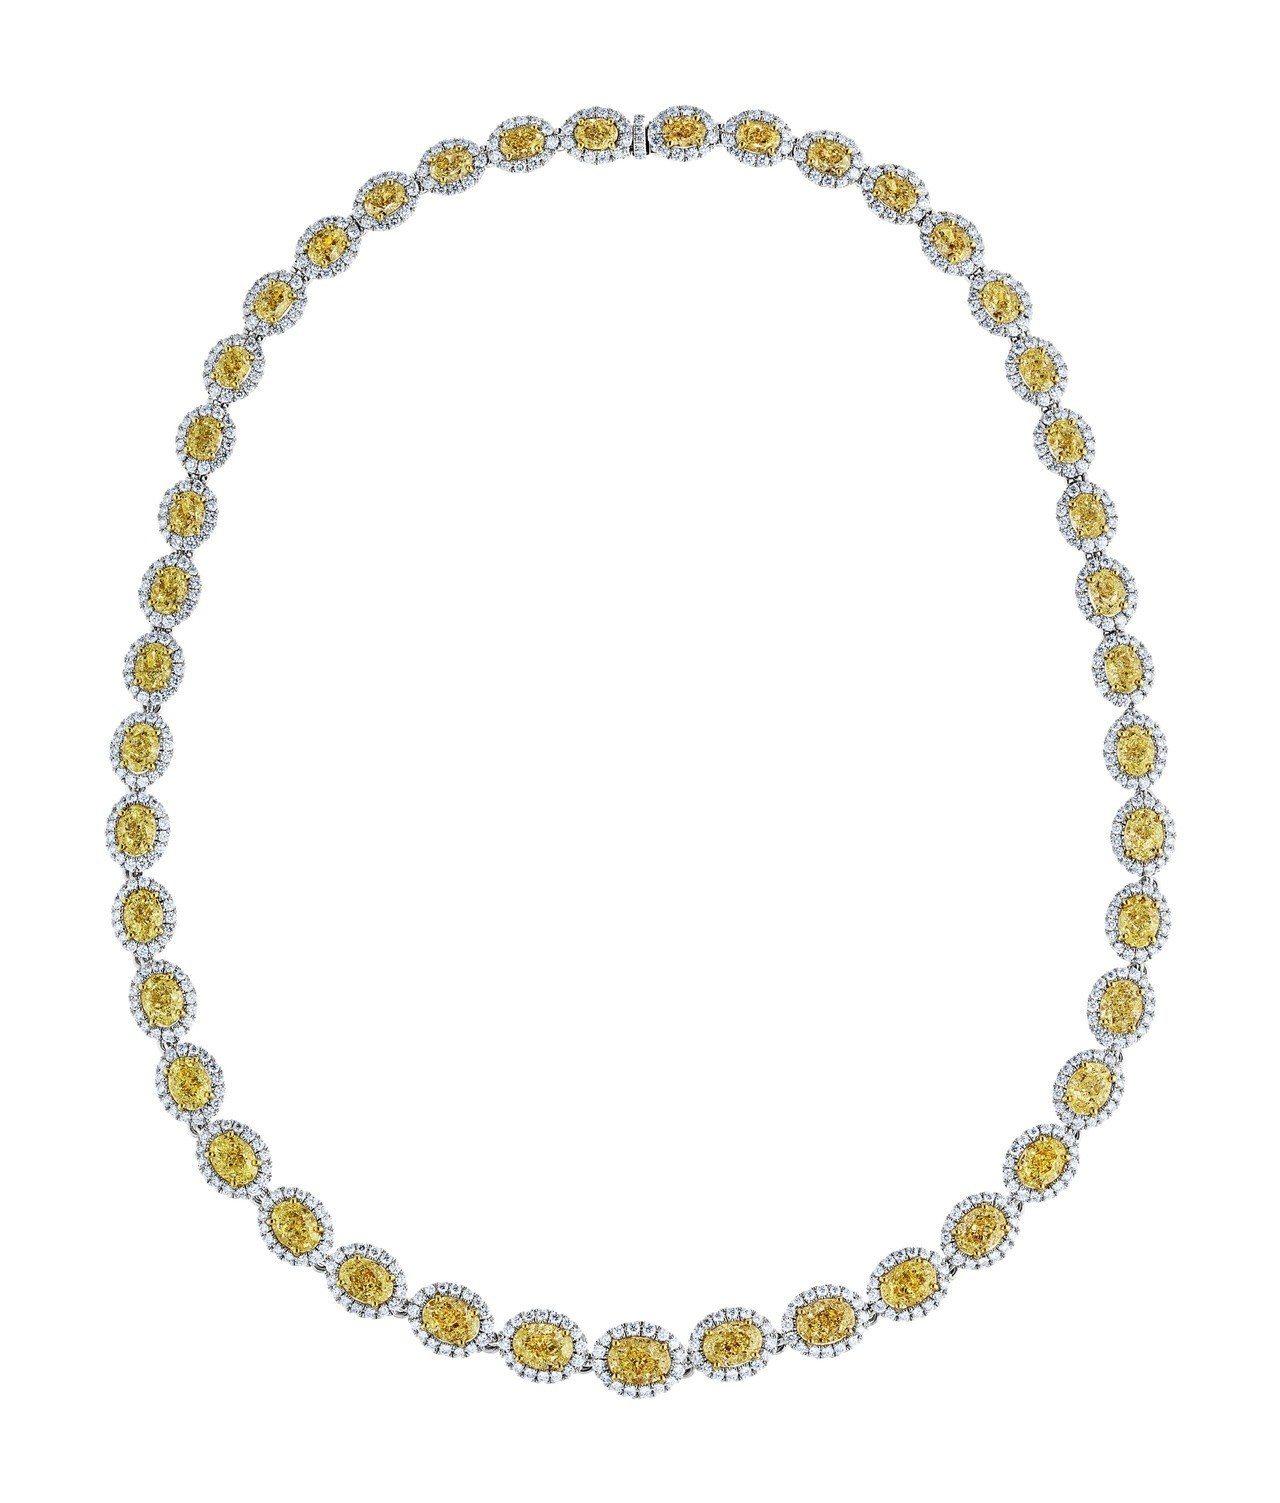 De Beers Aura 高級珠寶系列橢圓形車工黃鑽項鍊總重54.4克拉,98...